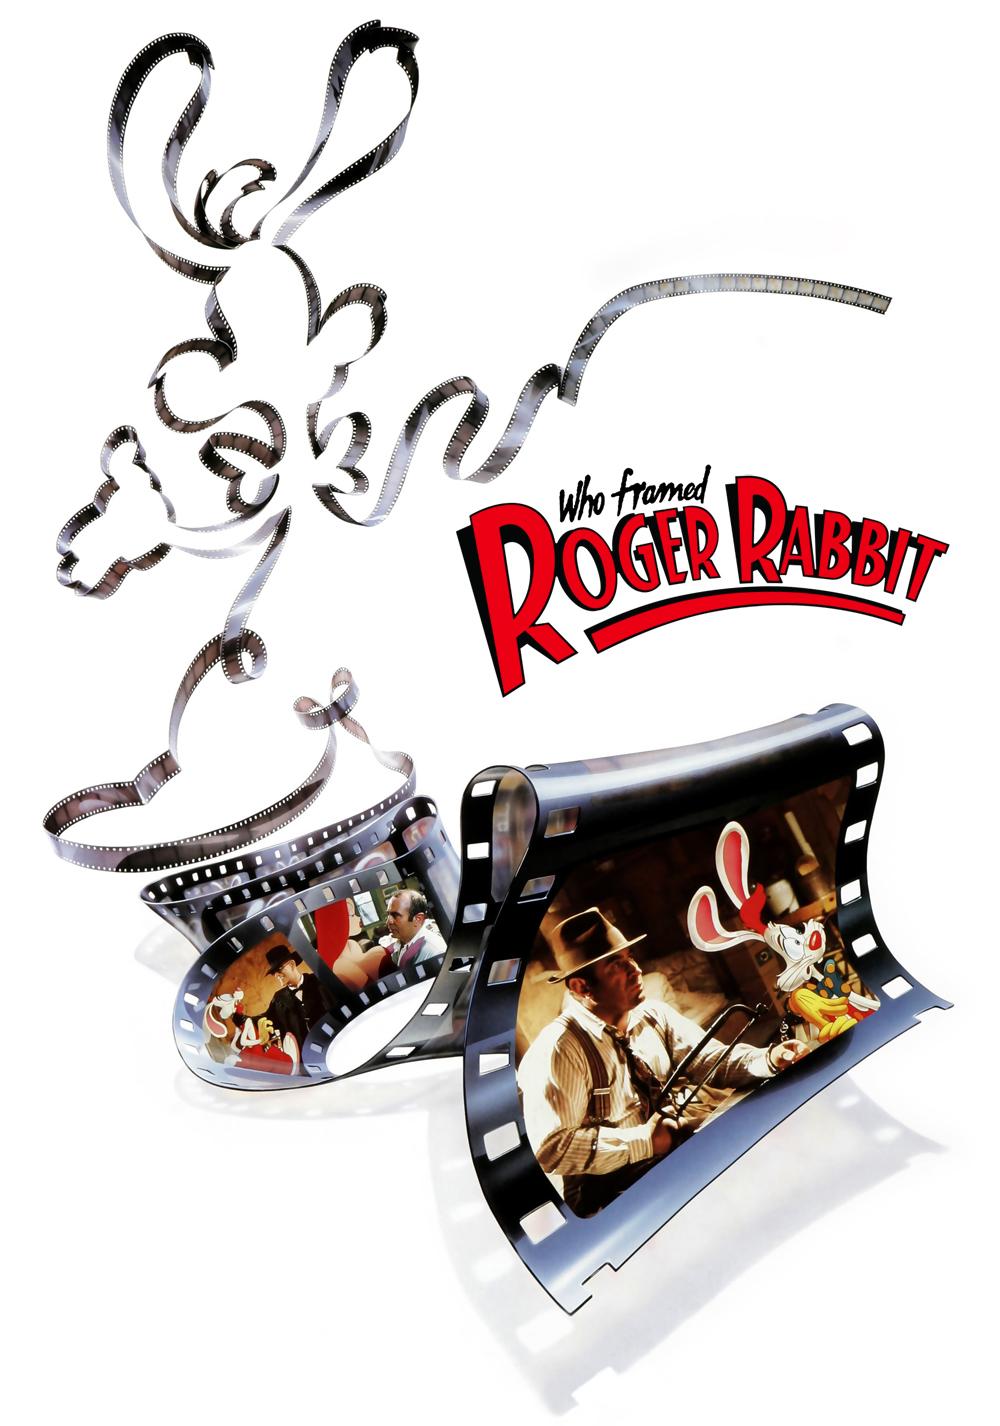 Who Framed Roger Rabbit Movie Poster Image